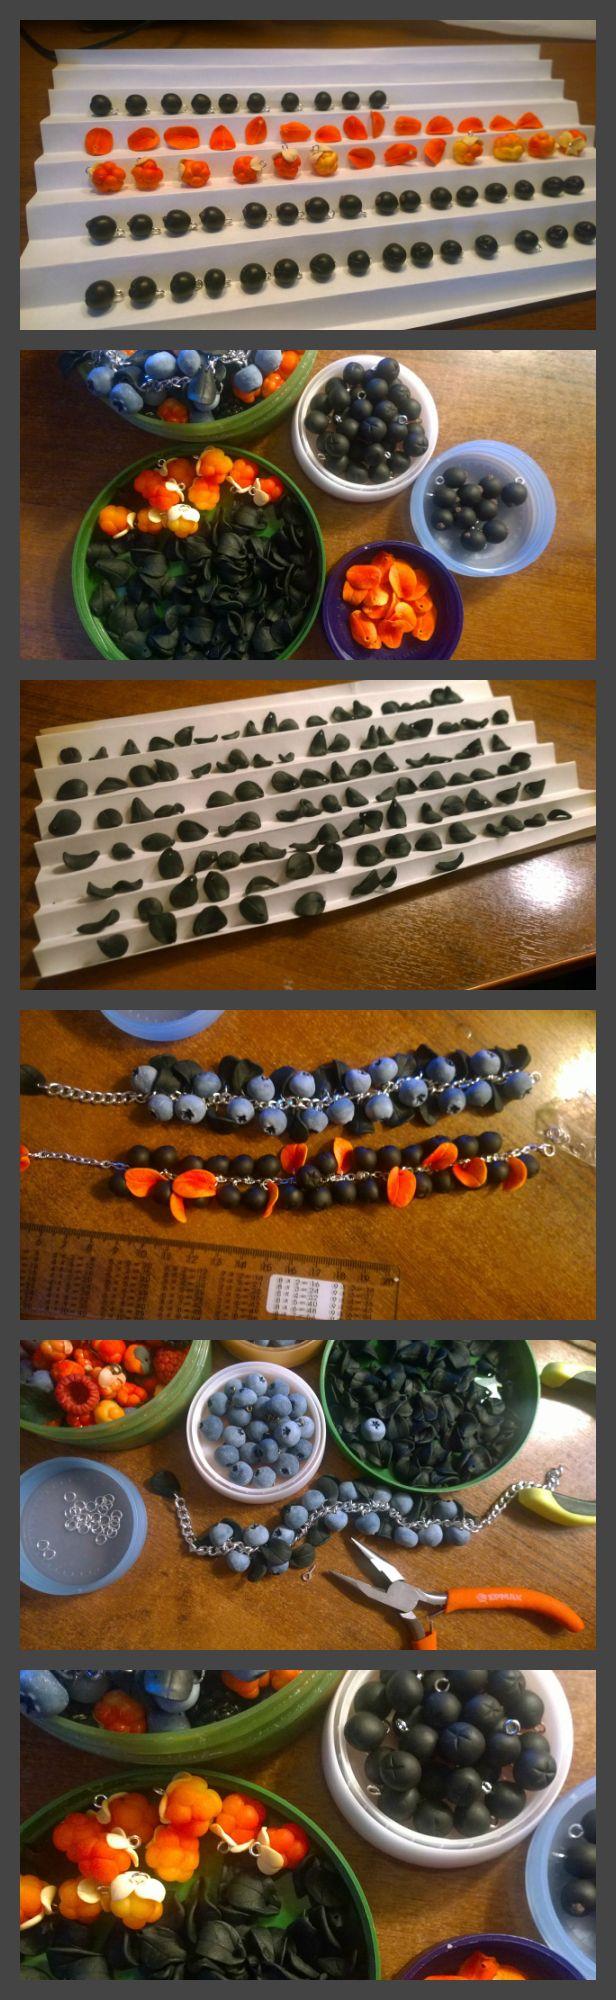 #вечер #творчество #хобби #полимернаяглина #ручнаяработа #ягоды #черника #голубика #polymerclay #fimo #fimoclay #premo #sculpey #jewelry #blueberries #berry #bracelet #summer #foodjewelry #handmade #etsy #процесс #работа